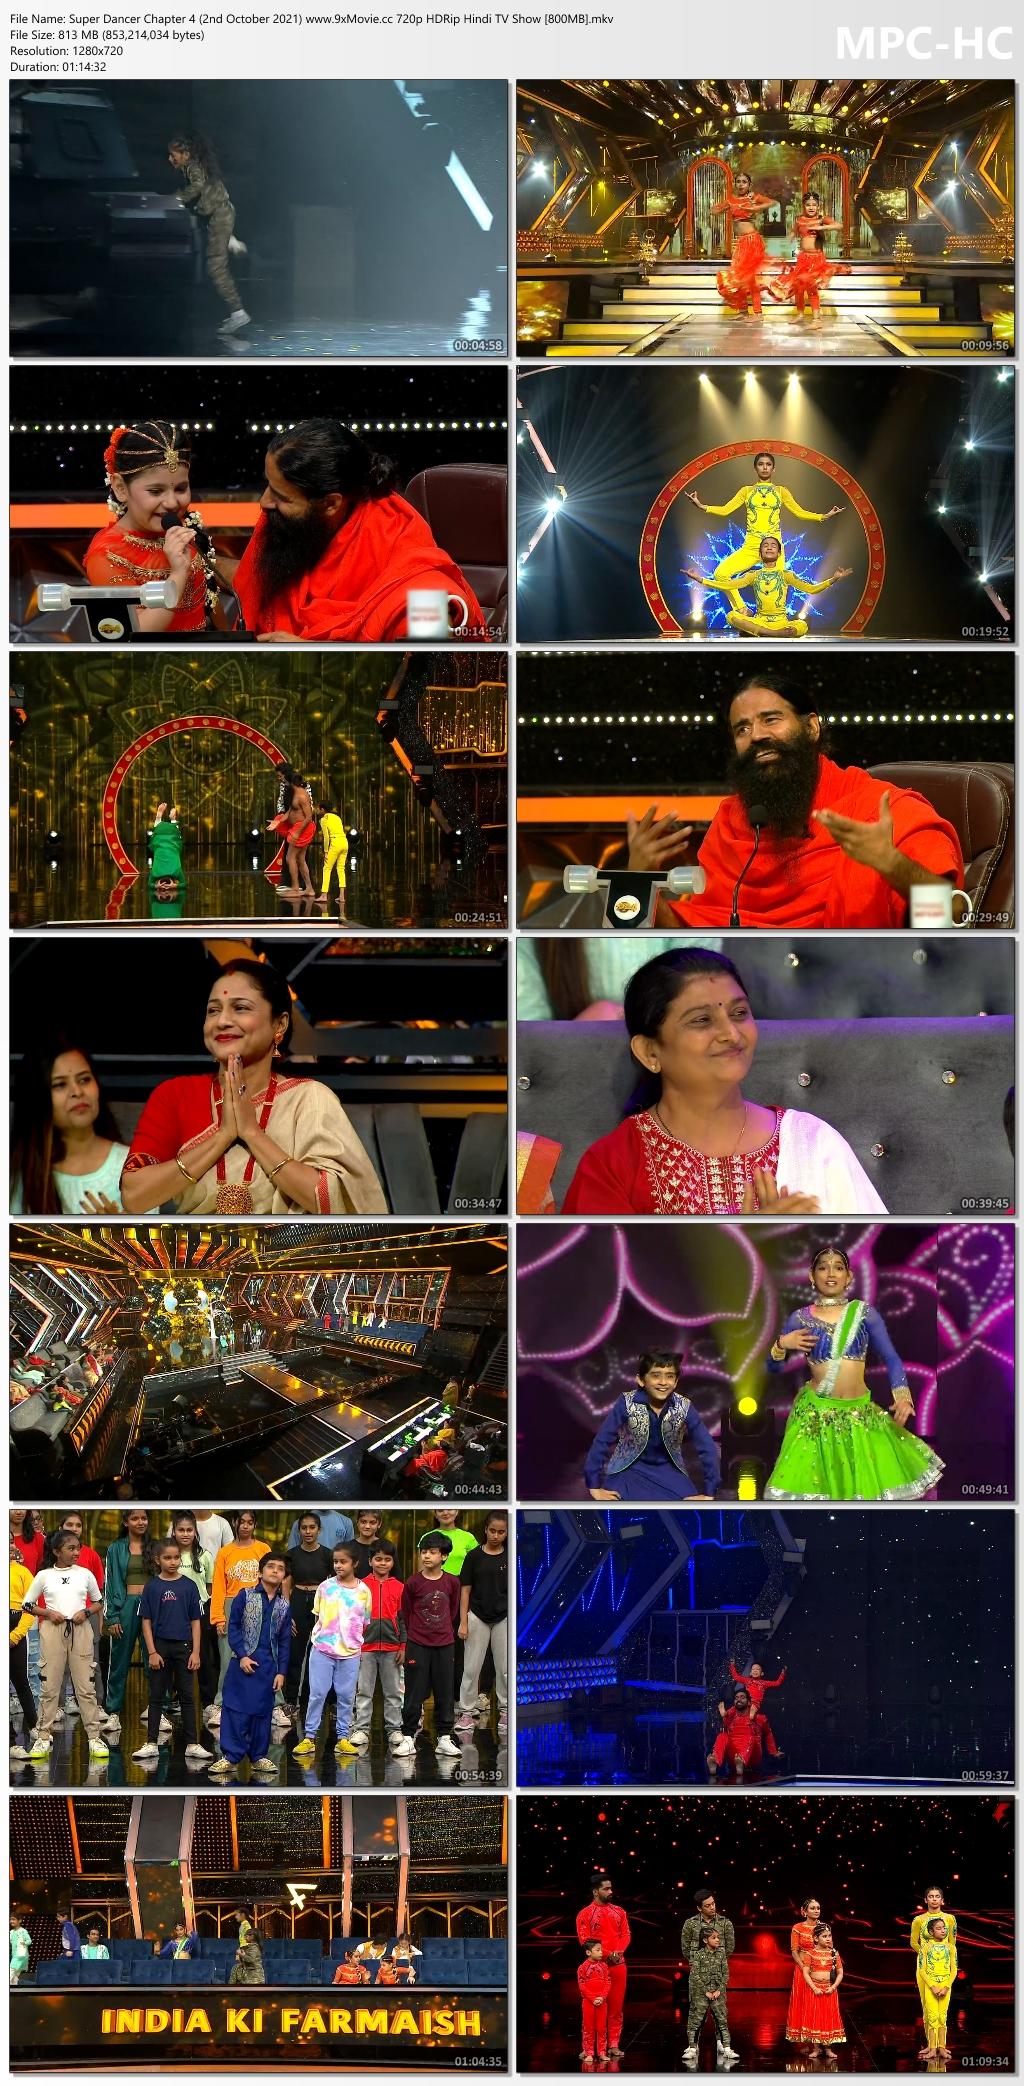 Super-Dancer-Chapter-4-2nd-October-2021-www-9x-Movie-cc-720p-HDRip-Hindi-TV-Show-800-MB-mkv